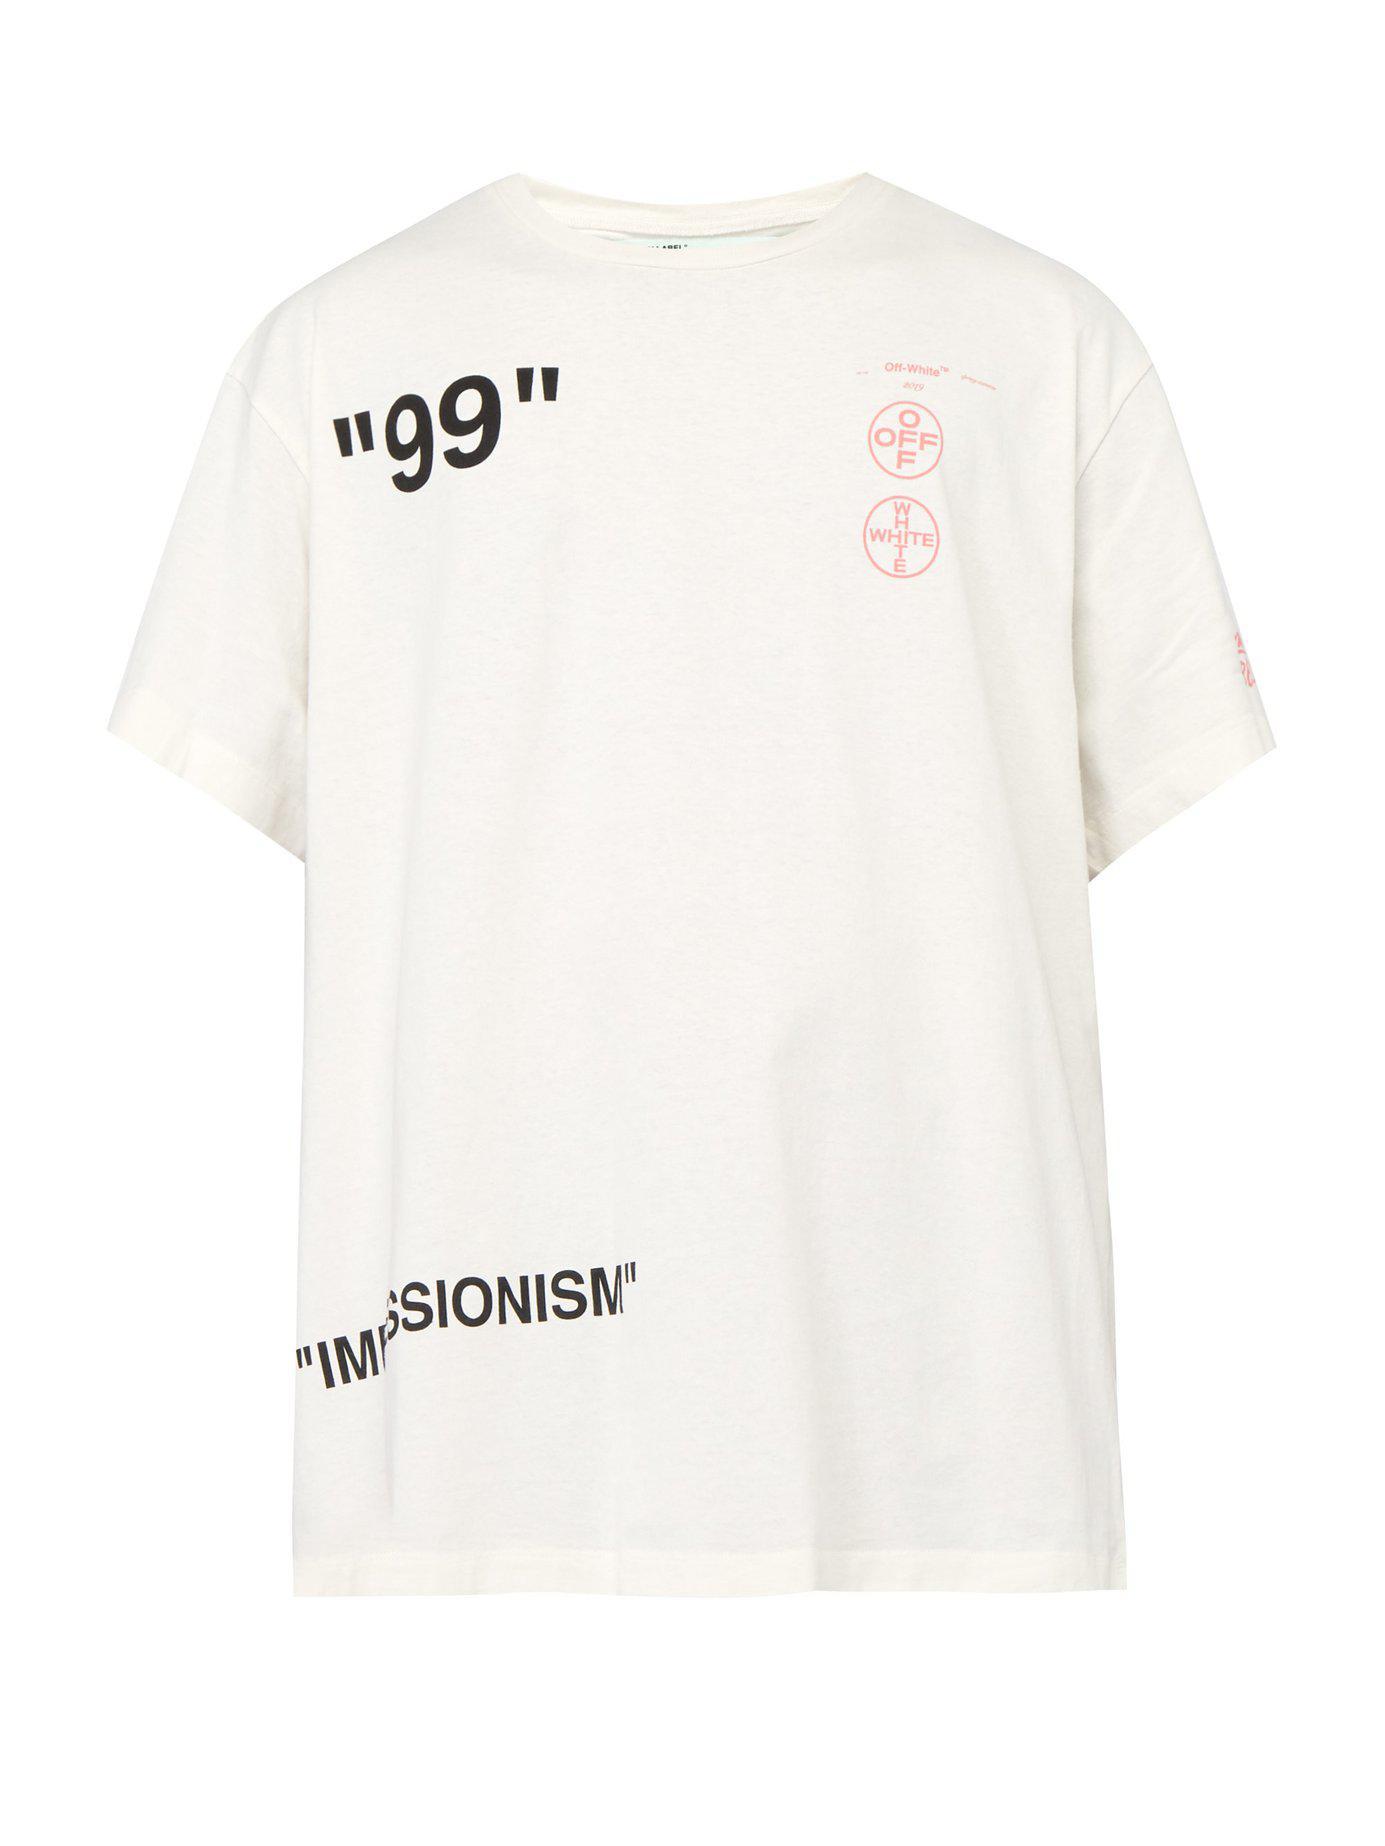 78082c54ecb089 Lyst - Off-White c o Virgil Abloh Impressionism Print T Shirt in ...